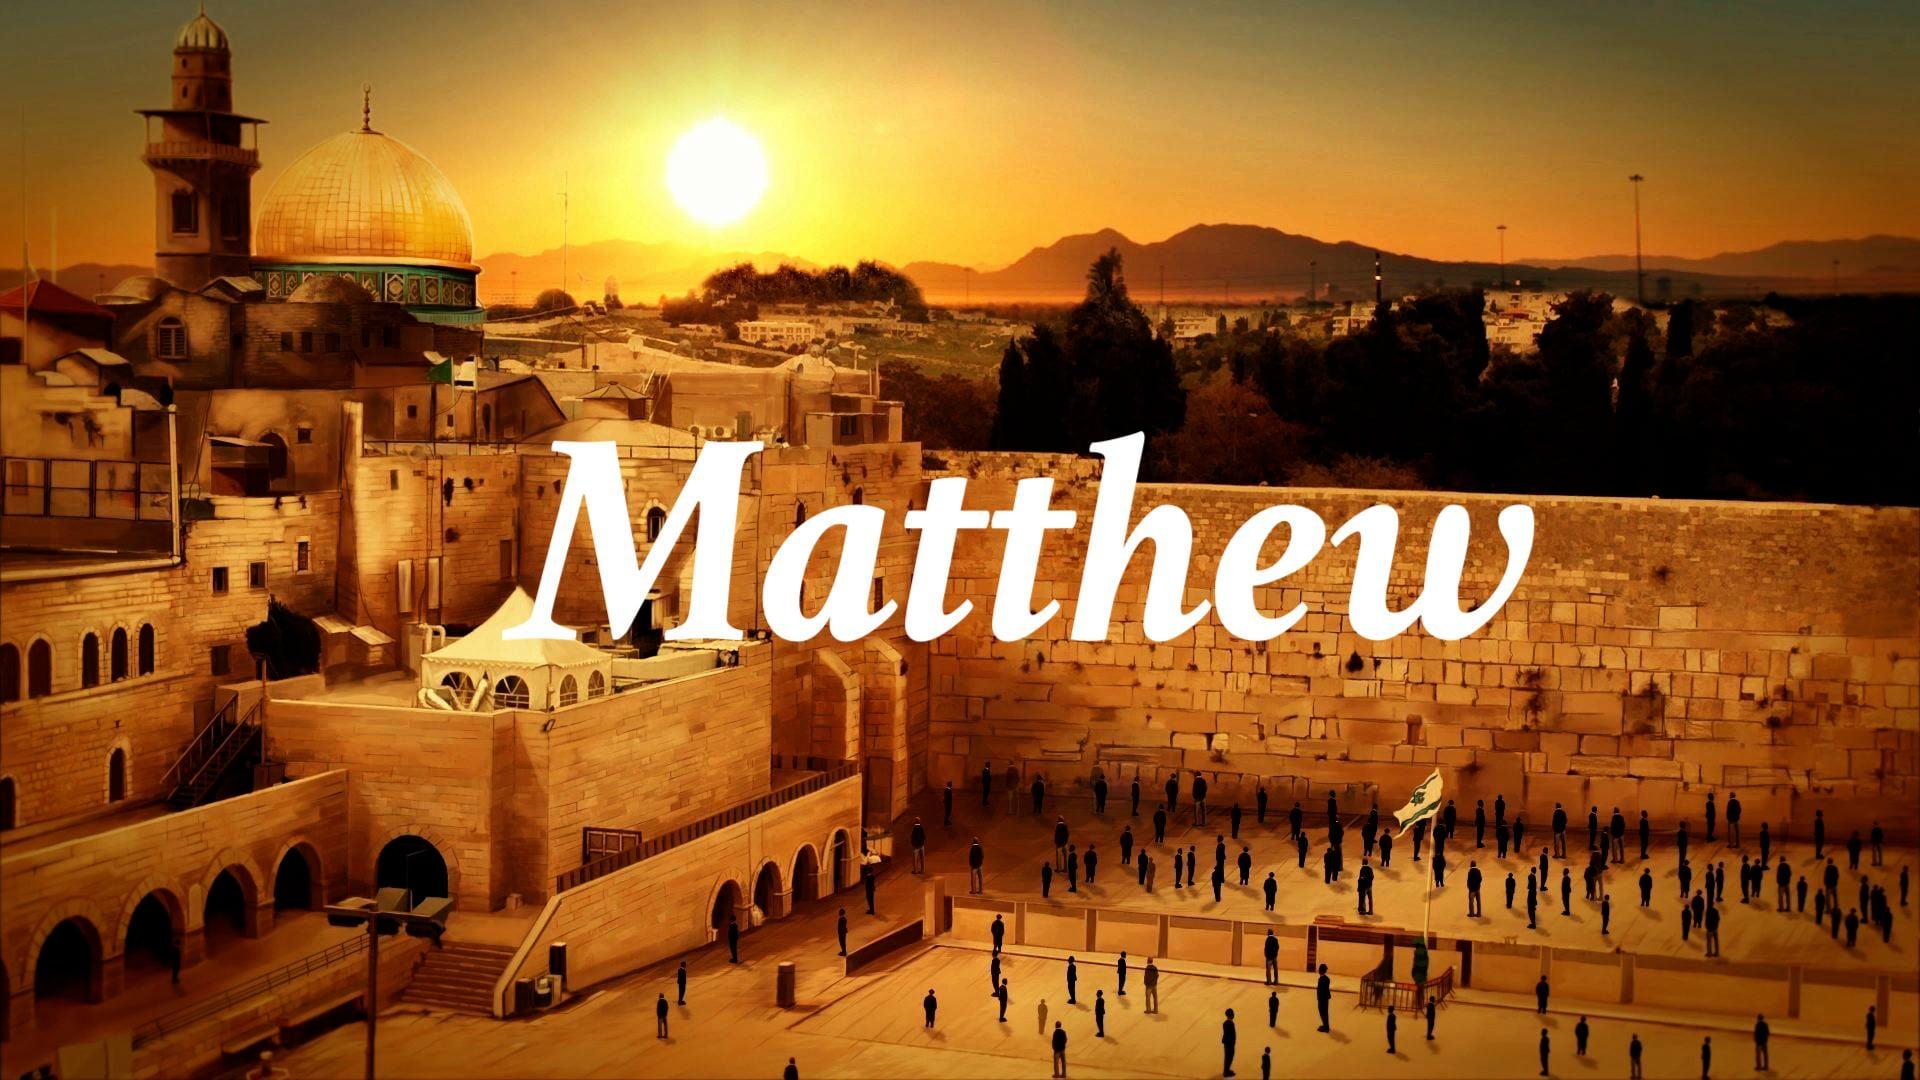 Matthew 10